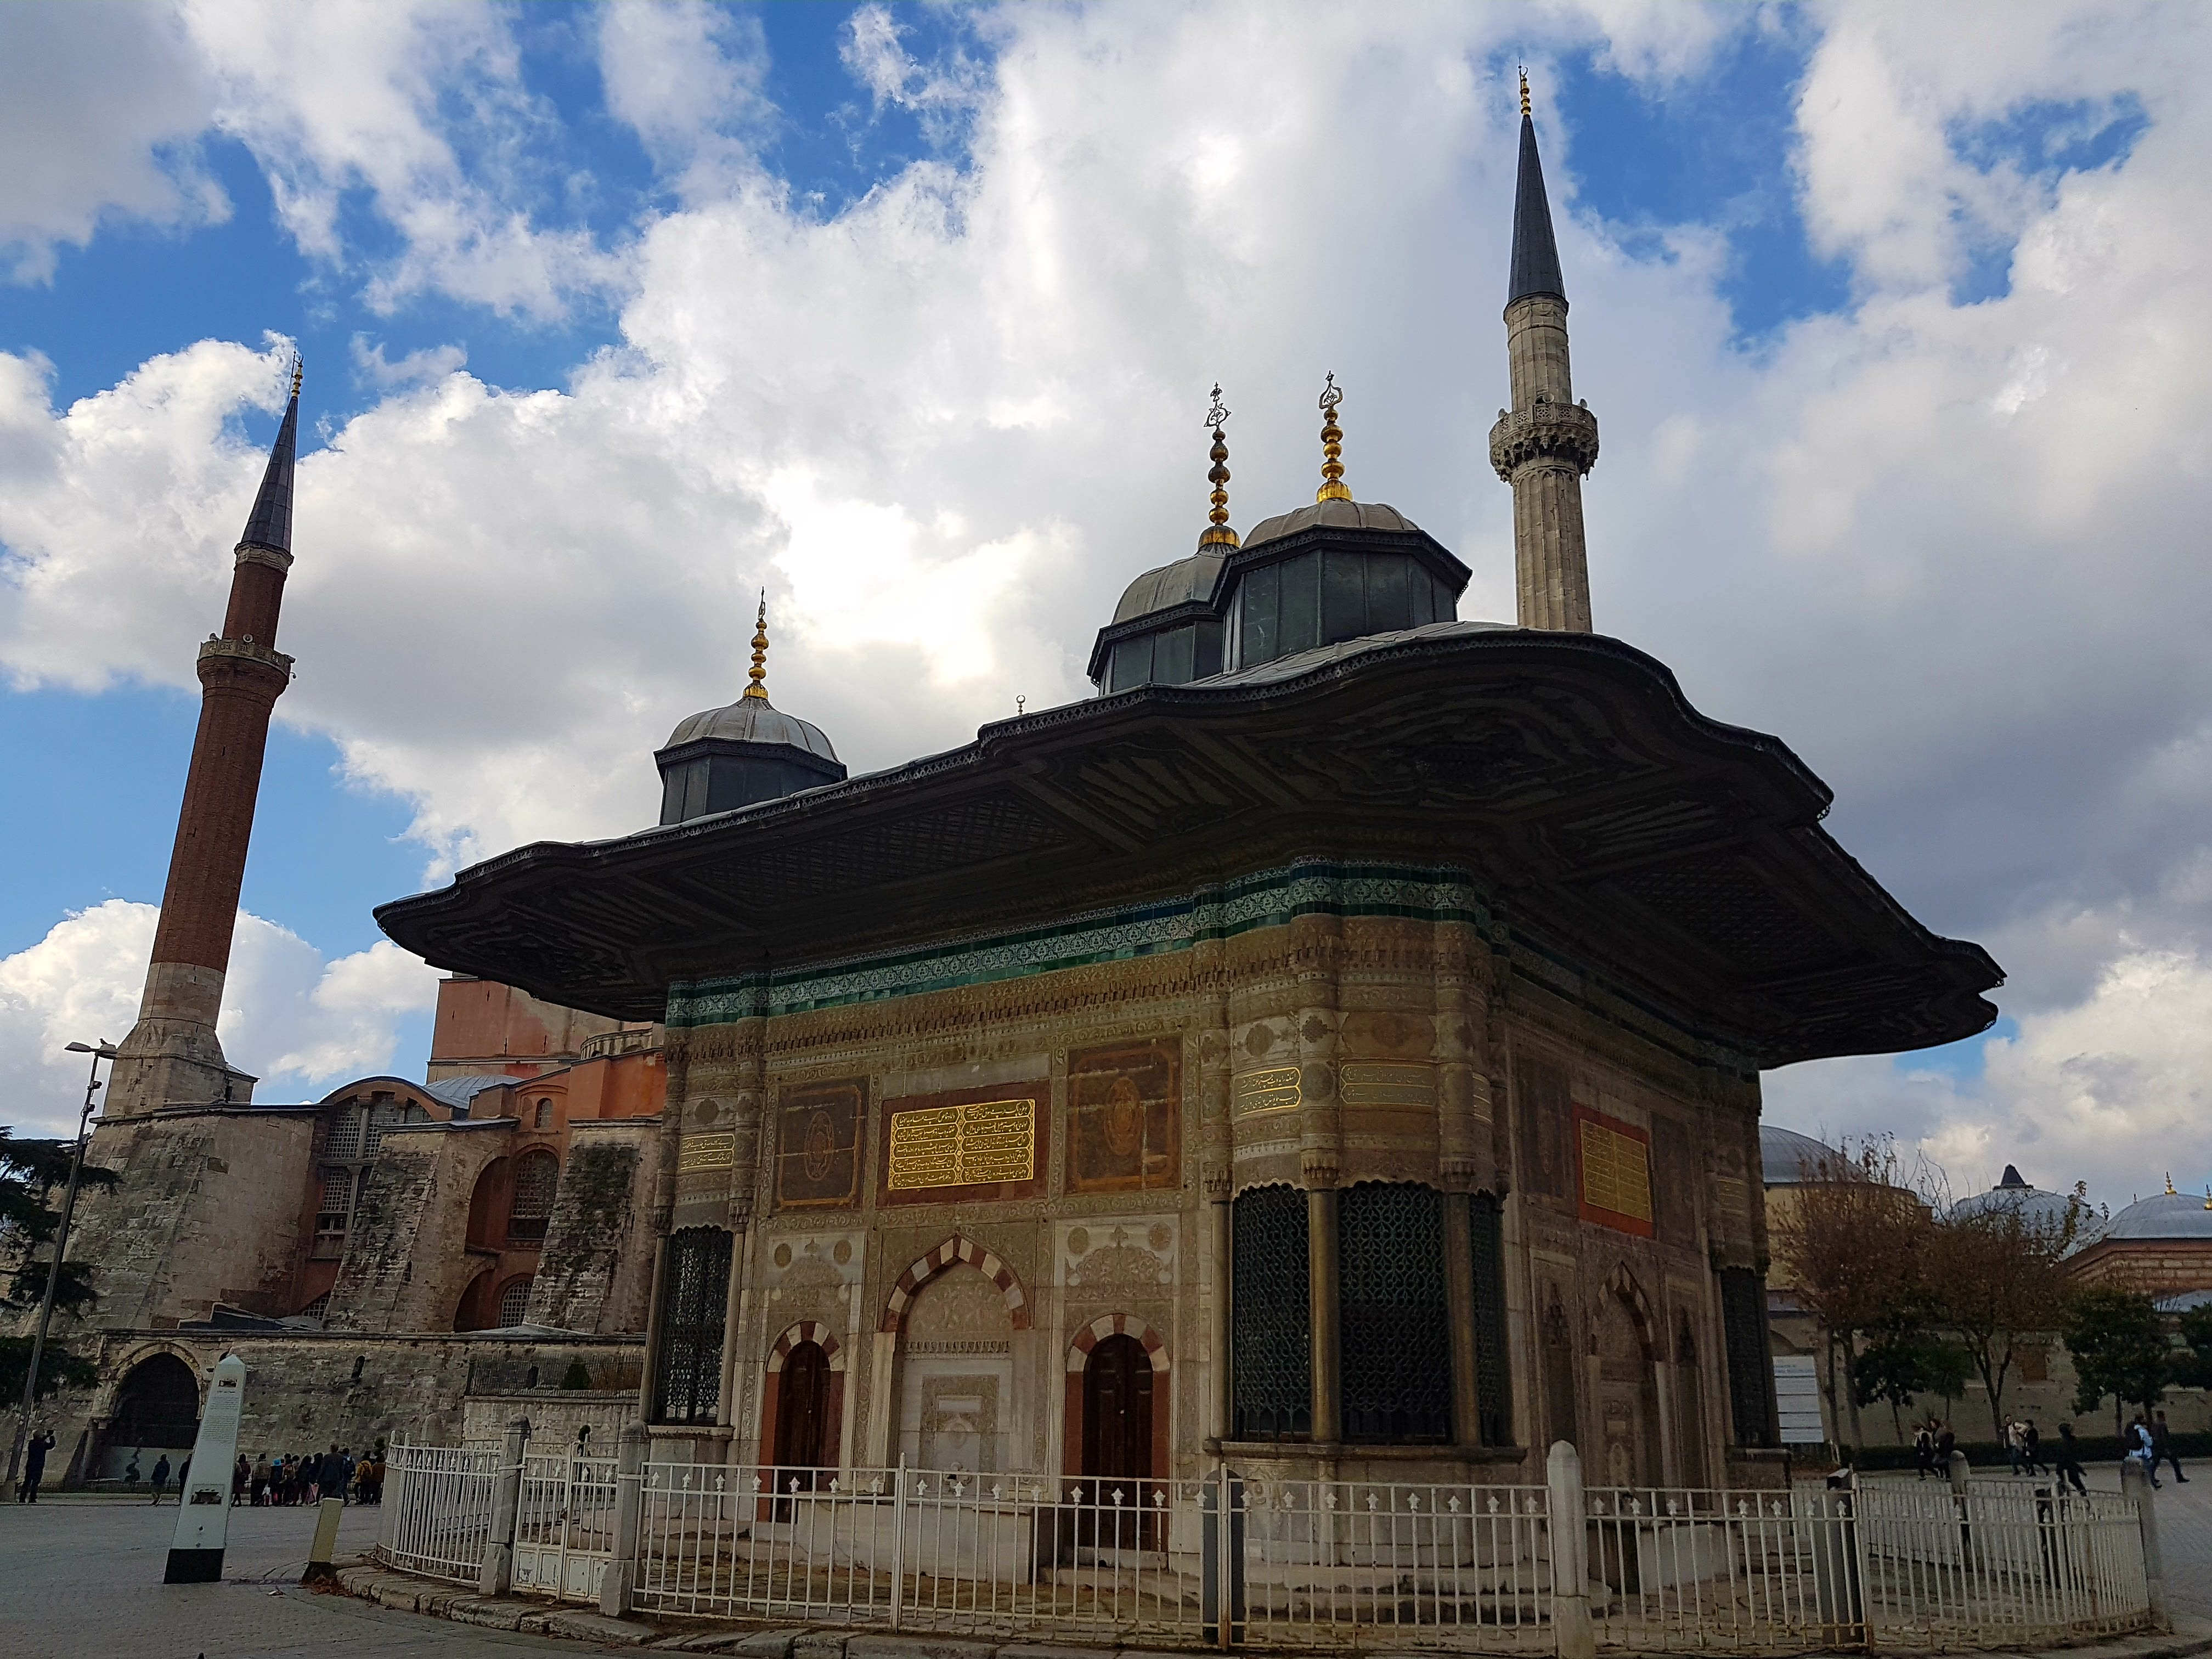 Saltan Ahmet III Fountain